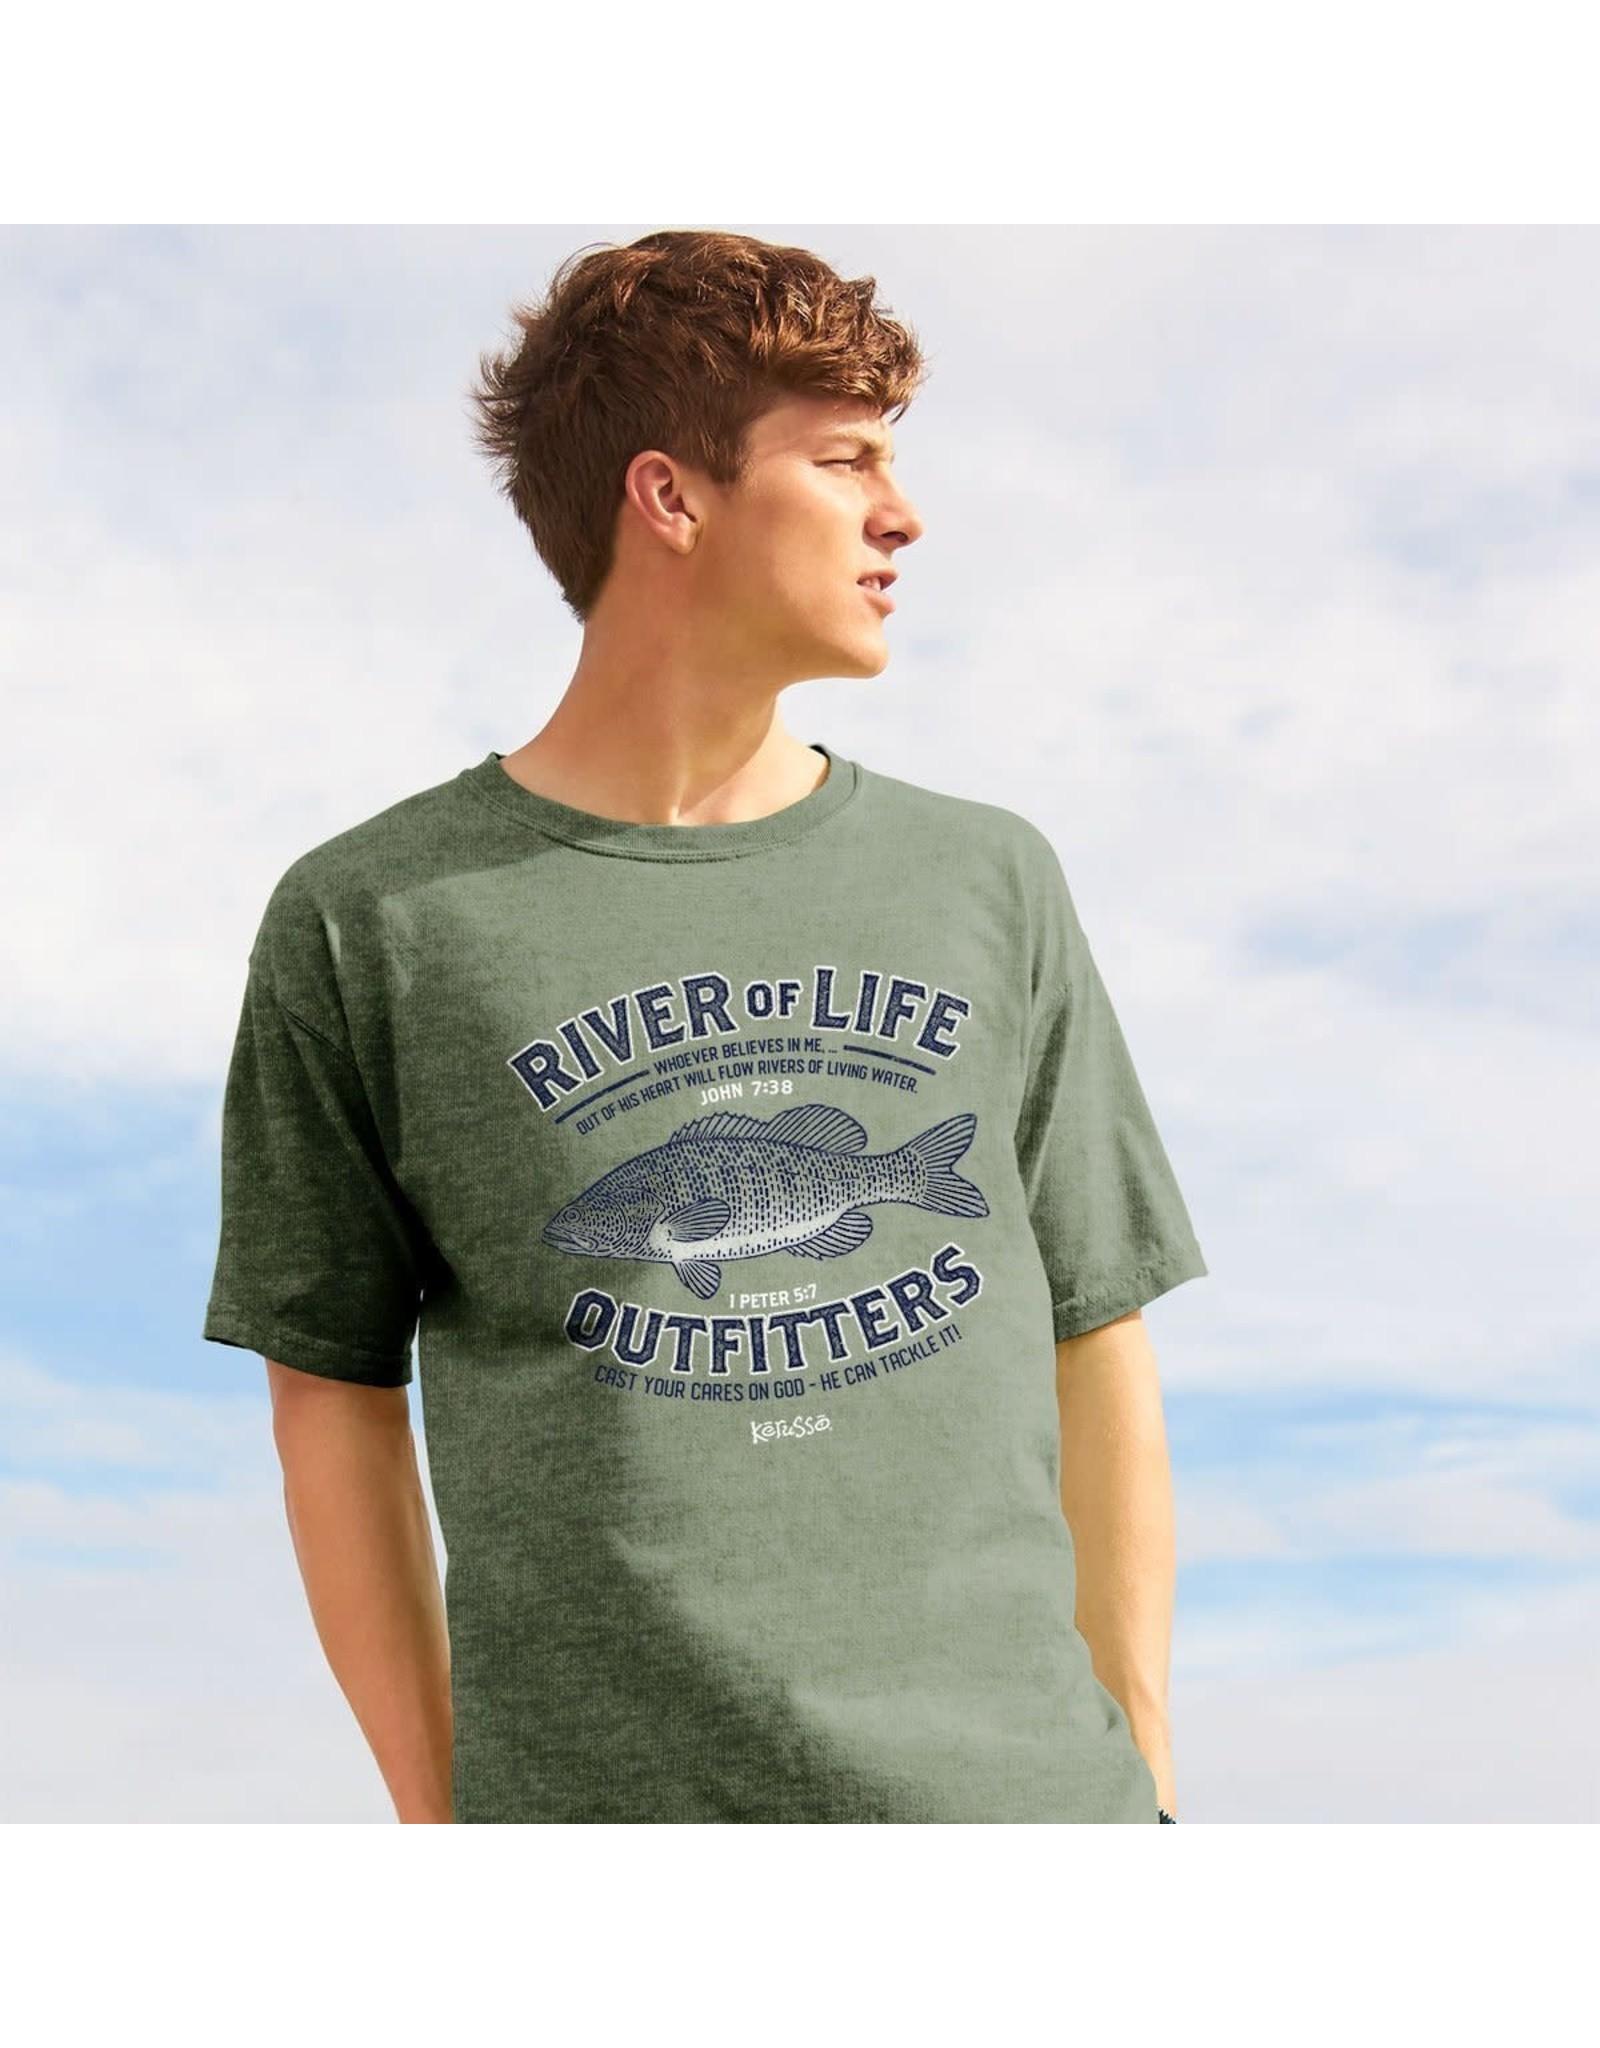 Adult Shirt - Fishing, River of Life